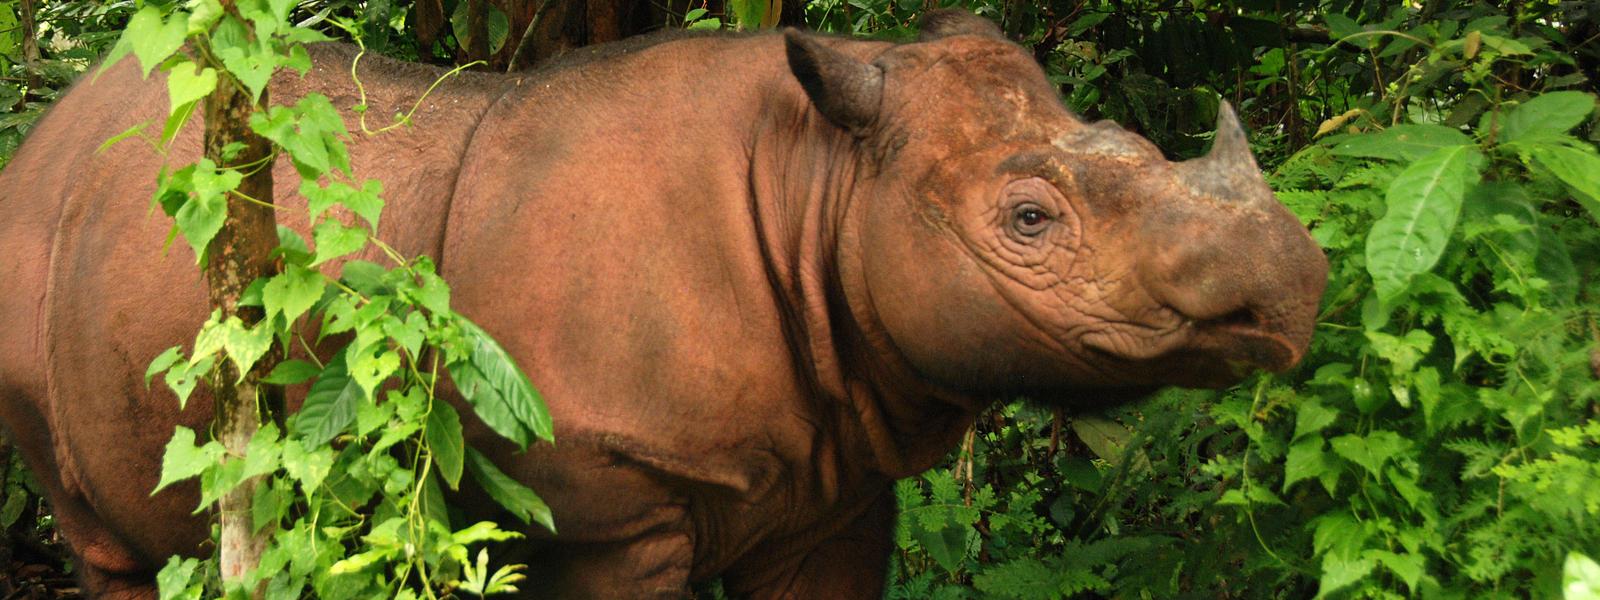 sumatran rhino species wwf